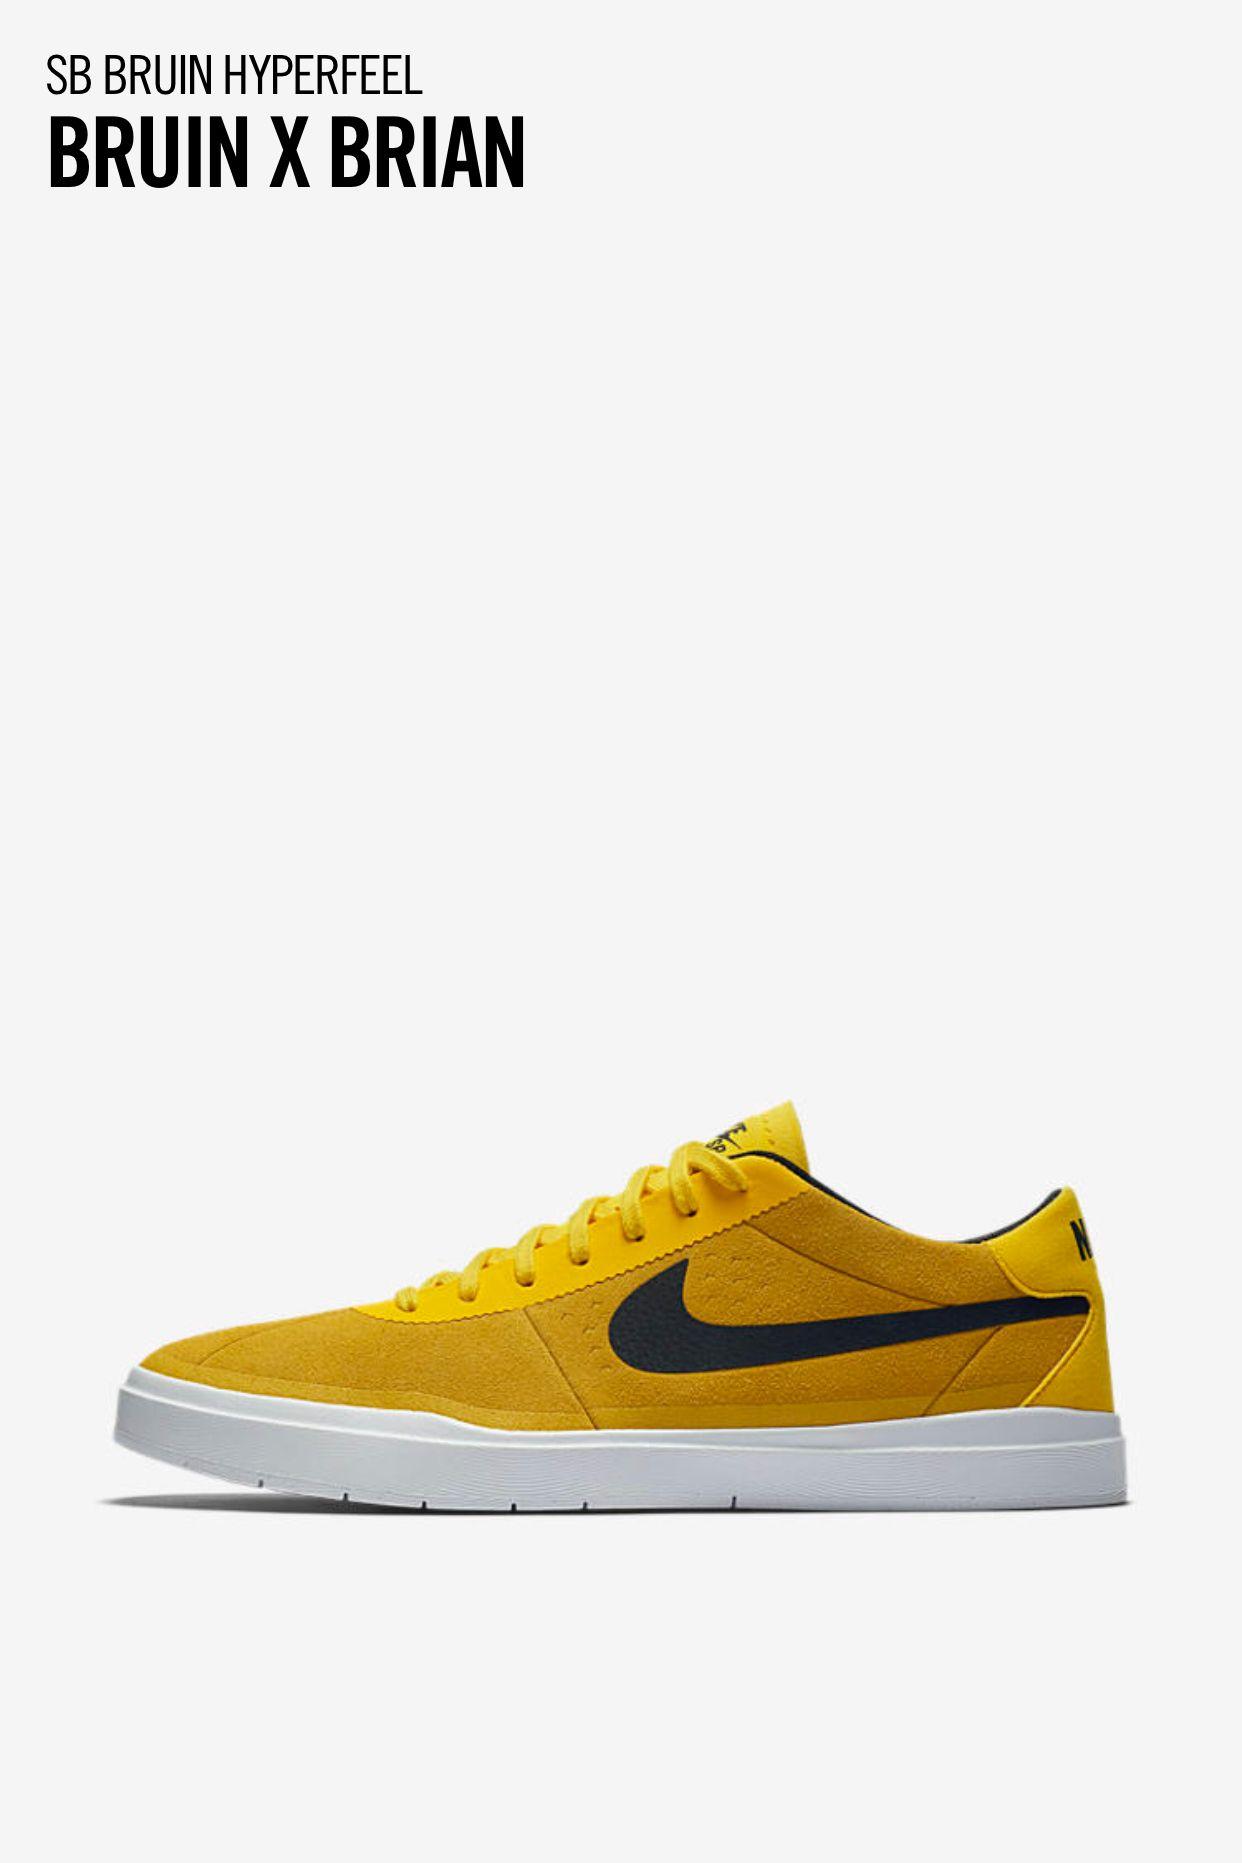 premium selection 98c4d df8d1 Via Nike+ SNKRS  nike .com snkrs thread 875d6dc2f9313c61fda81d6133b5e33226311c45